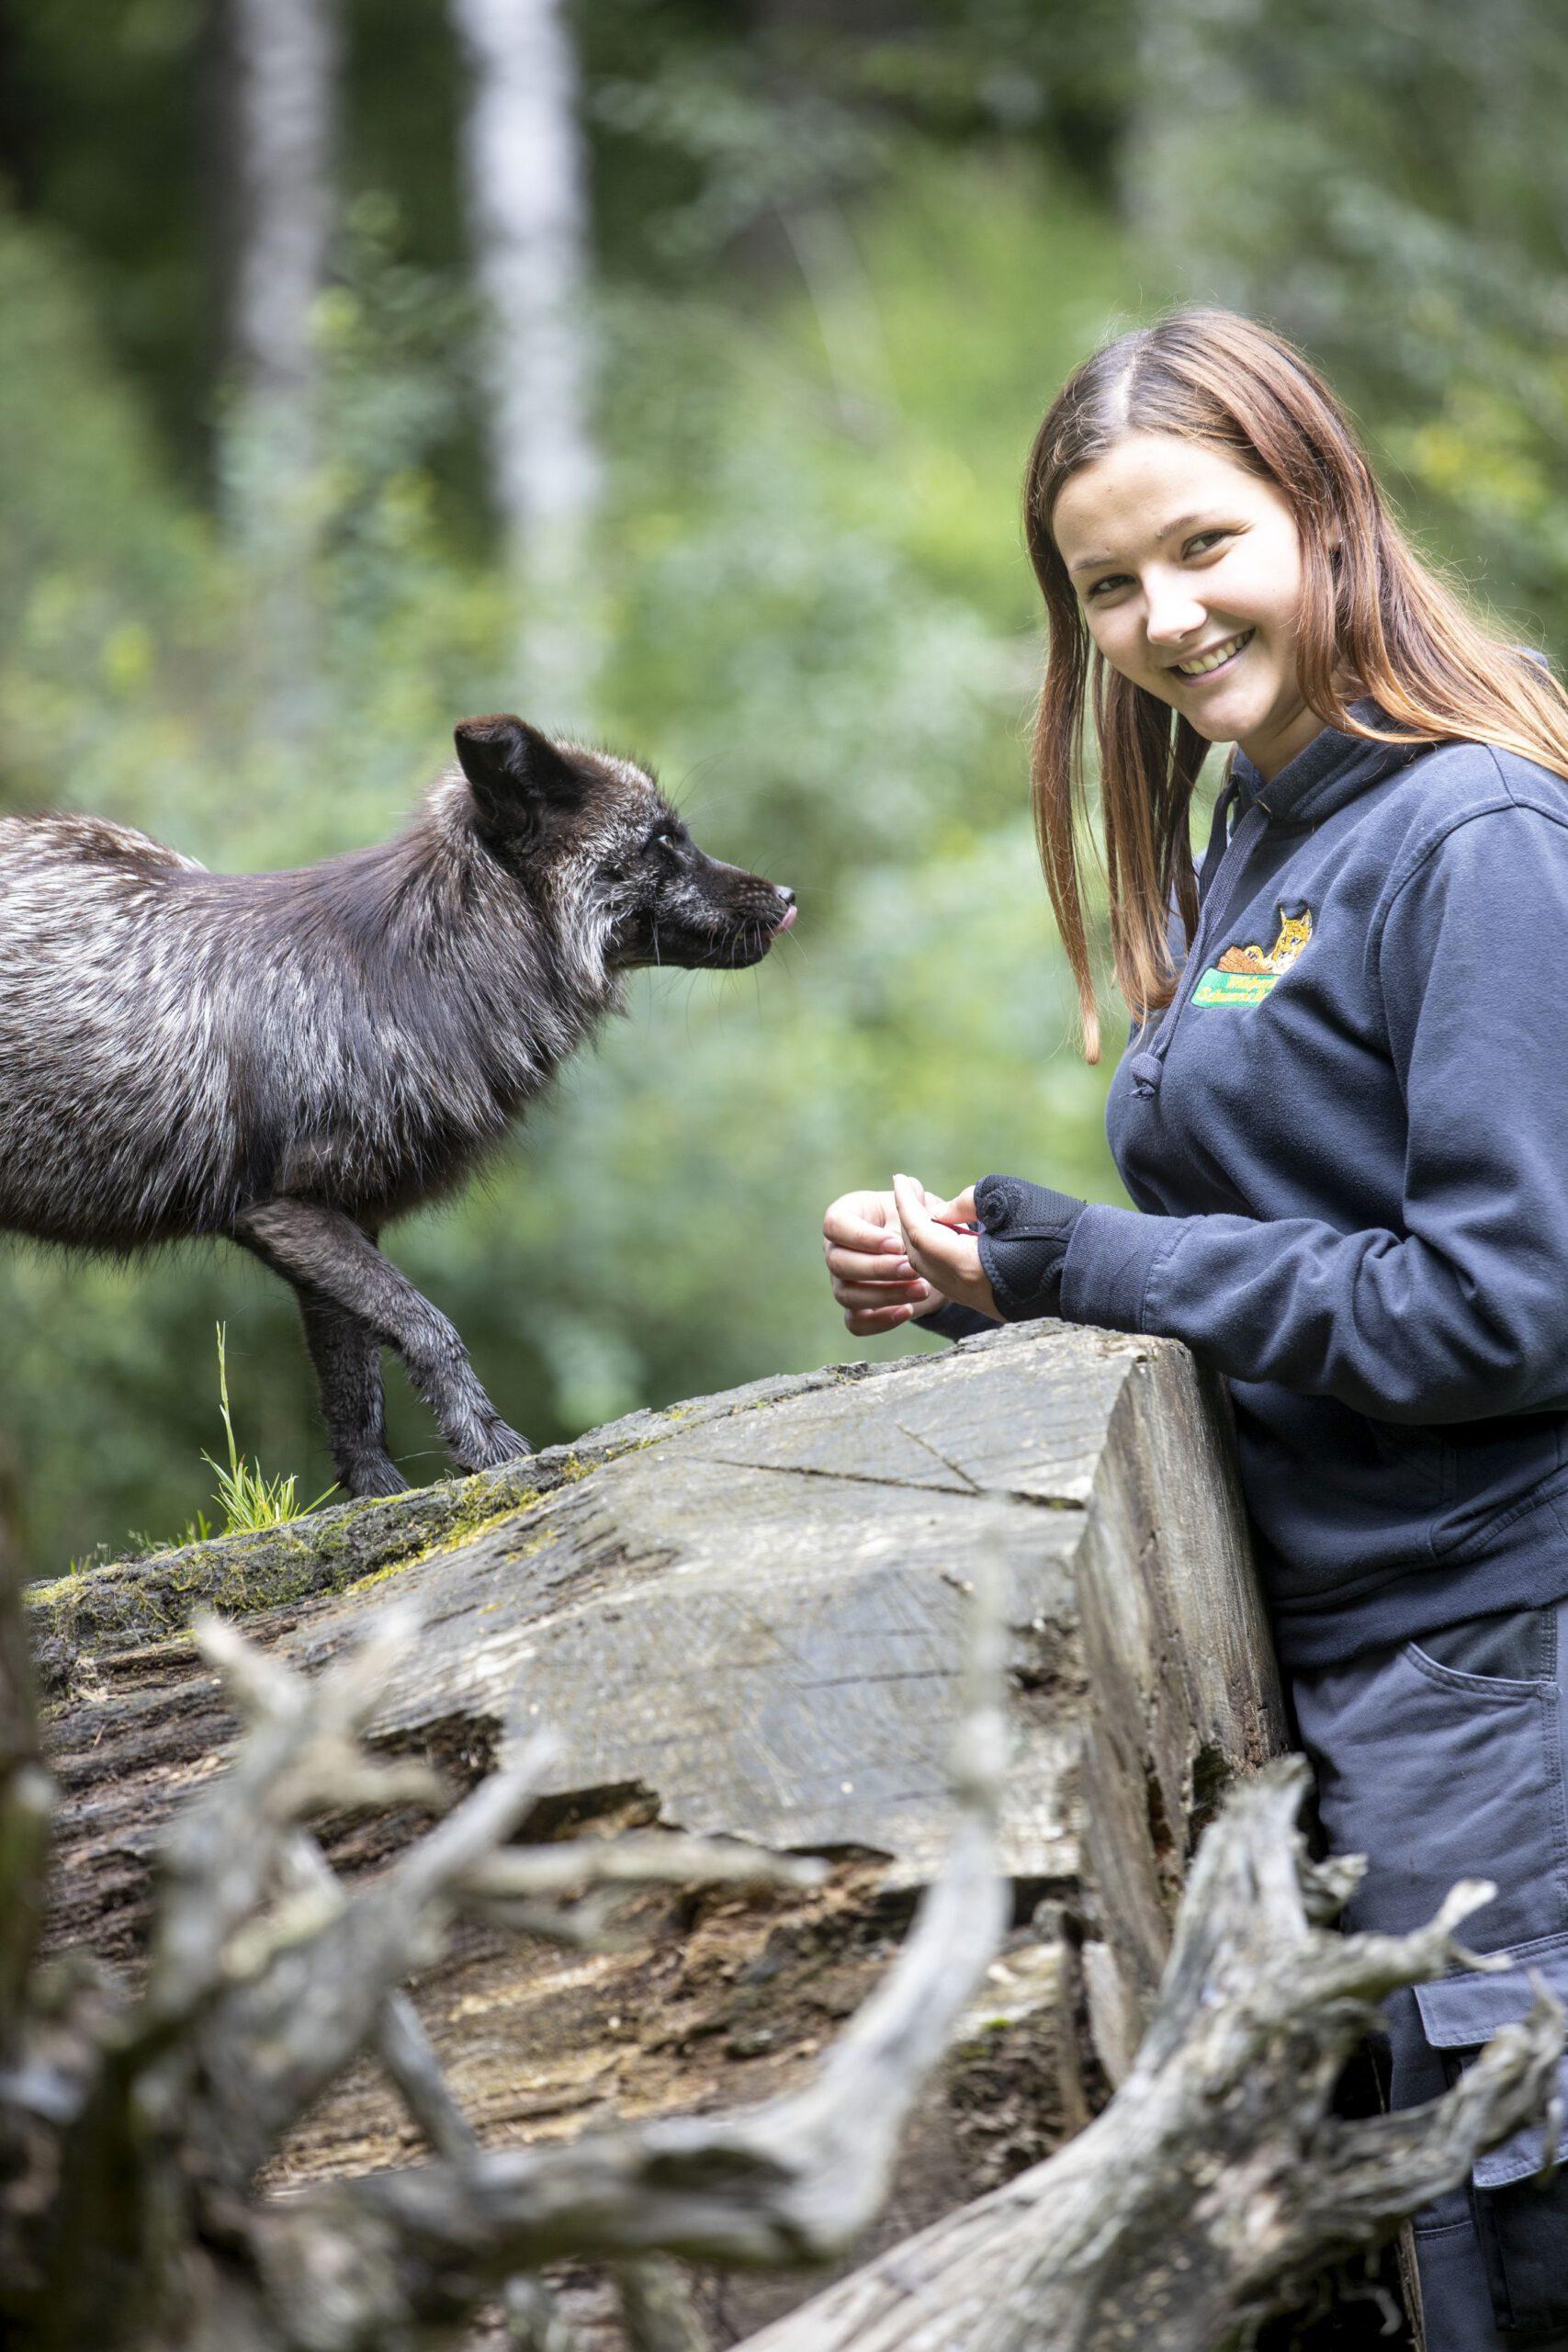 Moin Future Jennifer Vaubel 19 Tierpflegerin mit Silberfuchs Mogli